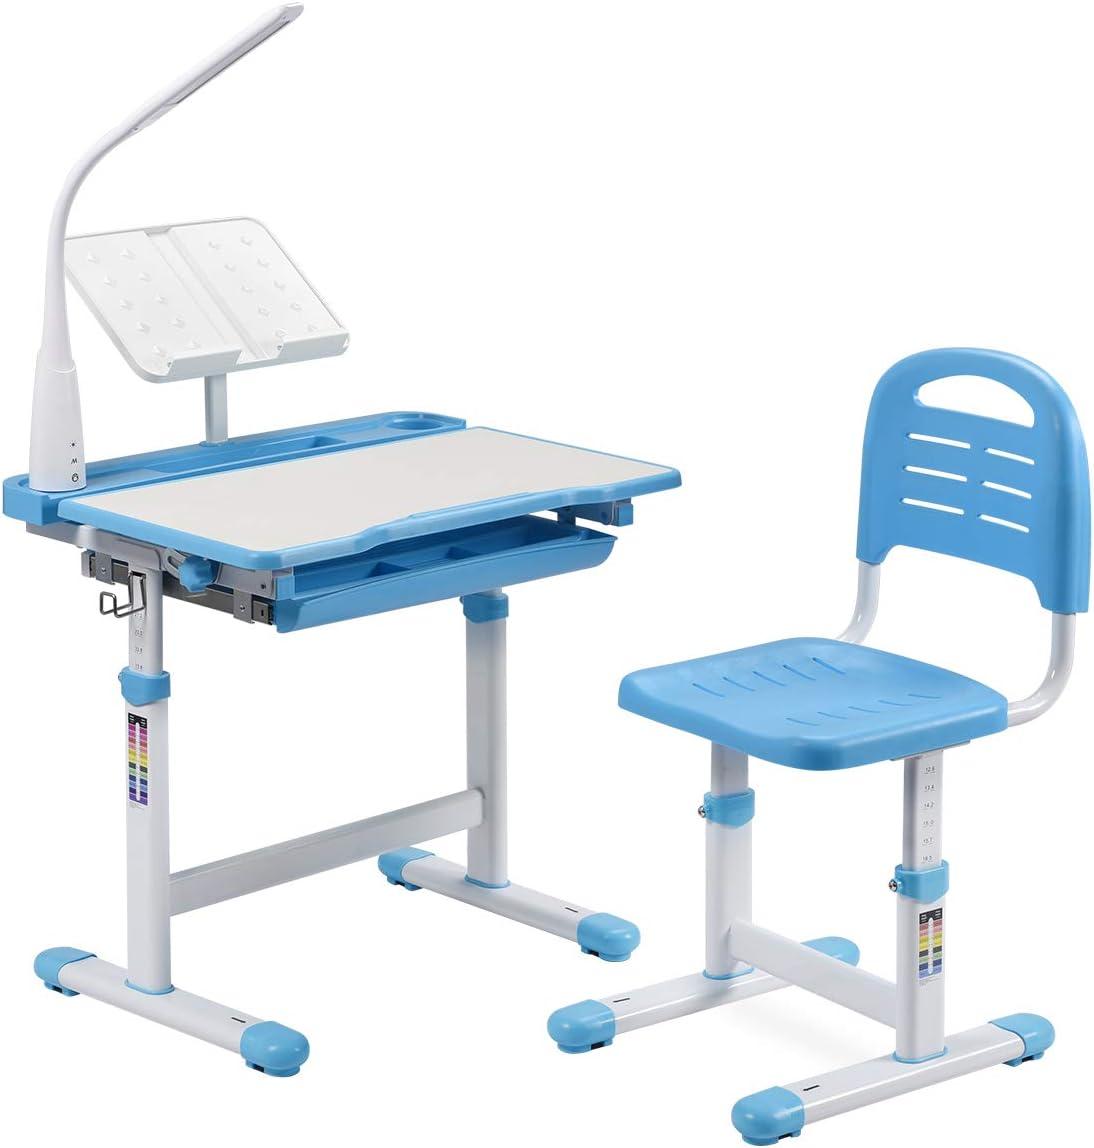 BiFanuo Kids Desks, Height Adjustable Children Desk and Chair Set,Childs School Student Sturdy Table with Tilt Desktop, LED Light、Pull Out Drawer Storage,Pencil Case,Metal Hook.Bookstand (Blue)